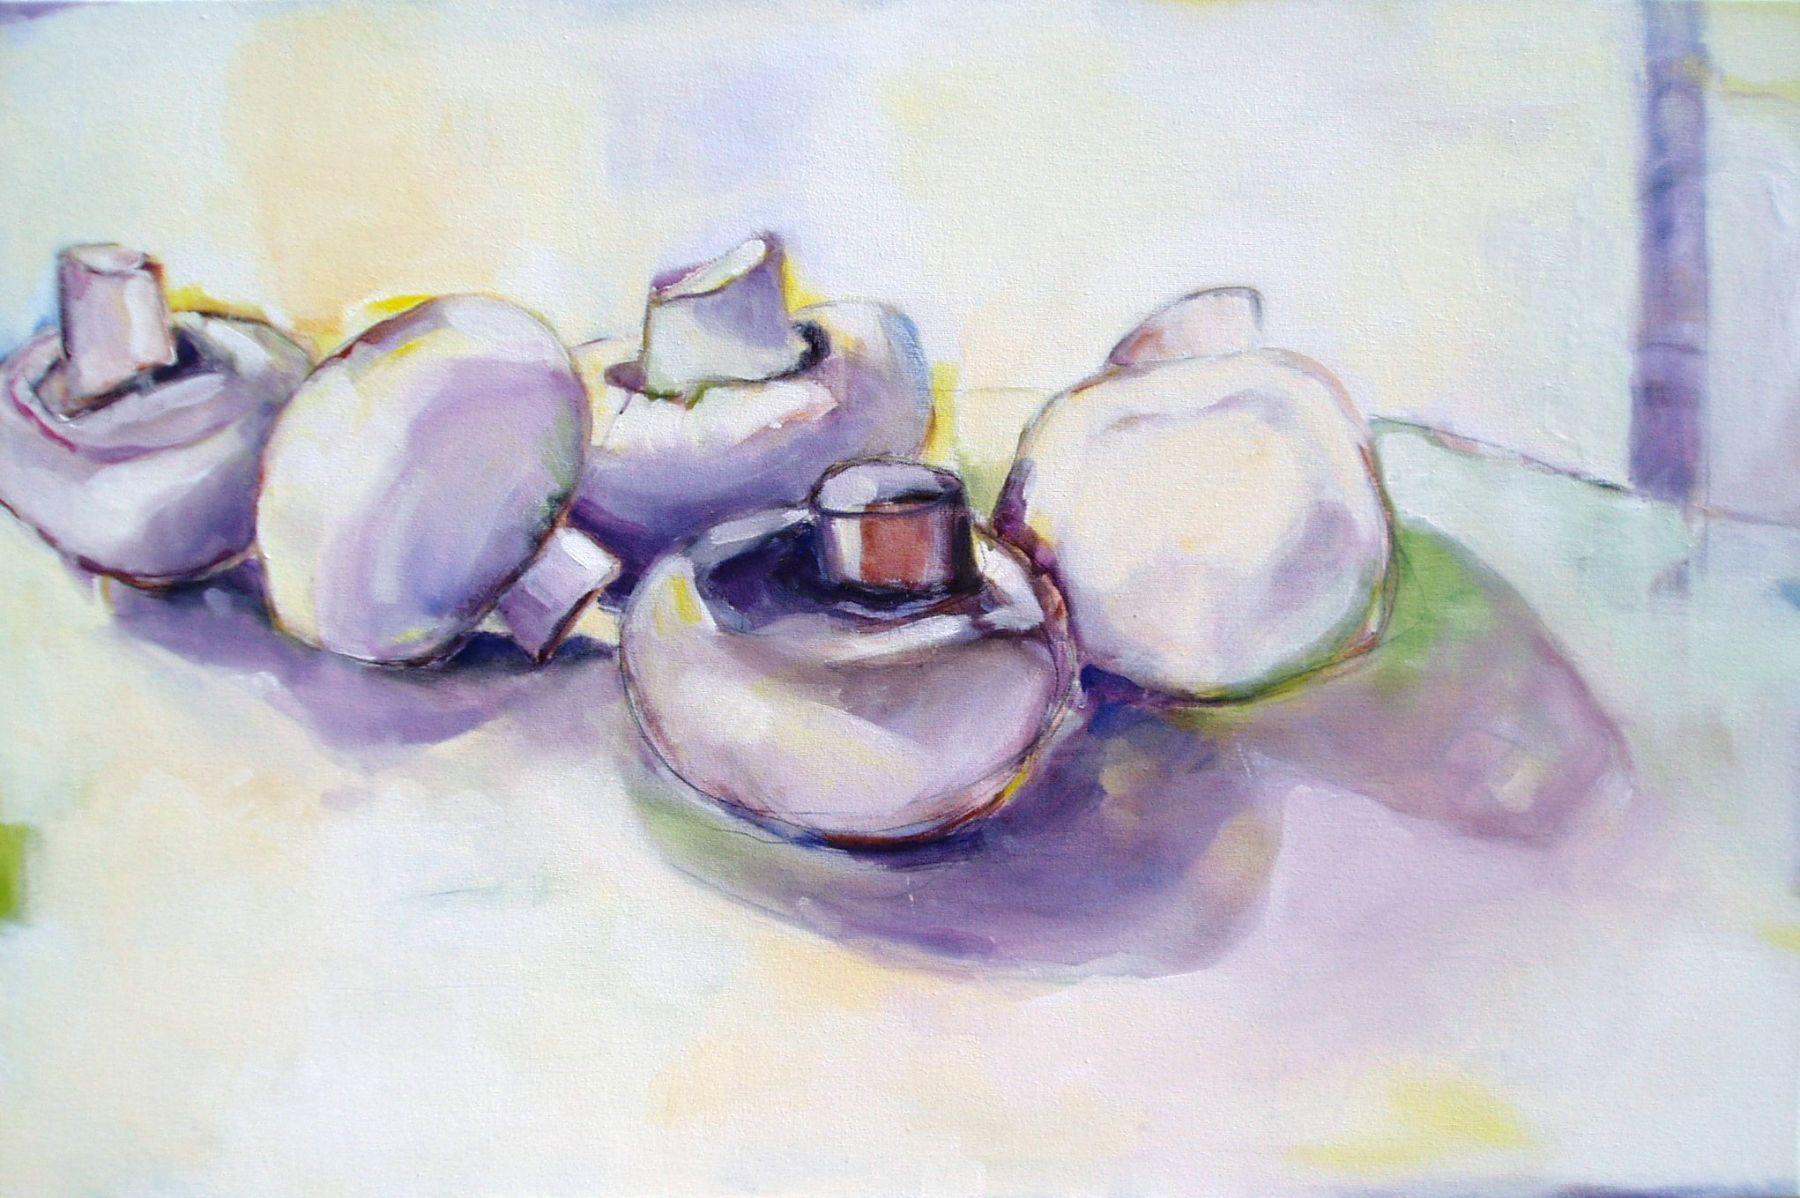 Mushrooms - painting, acrylic on canvas by artist Neva Bergemann